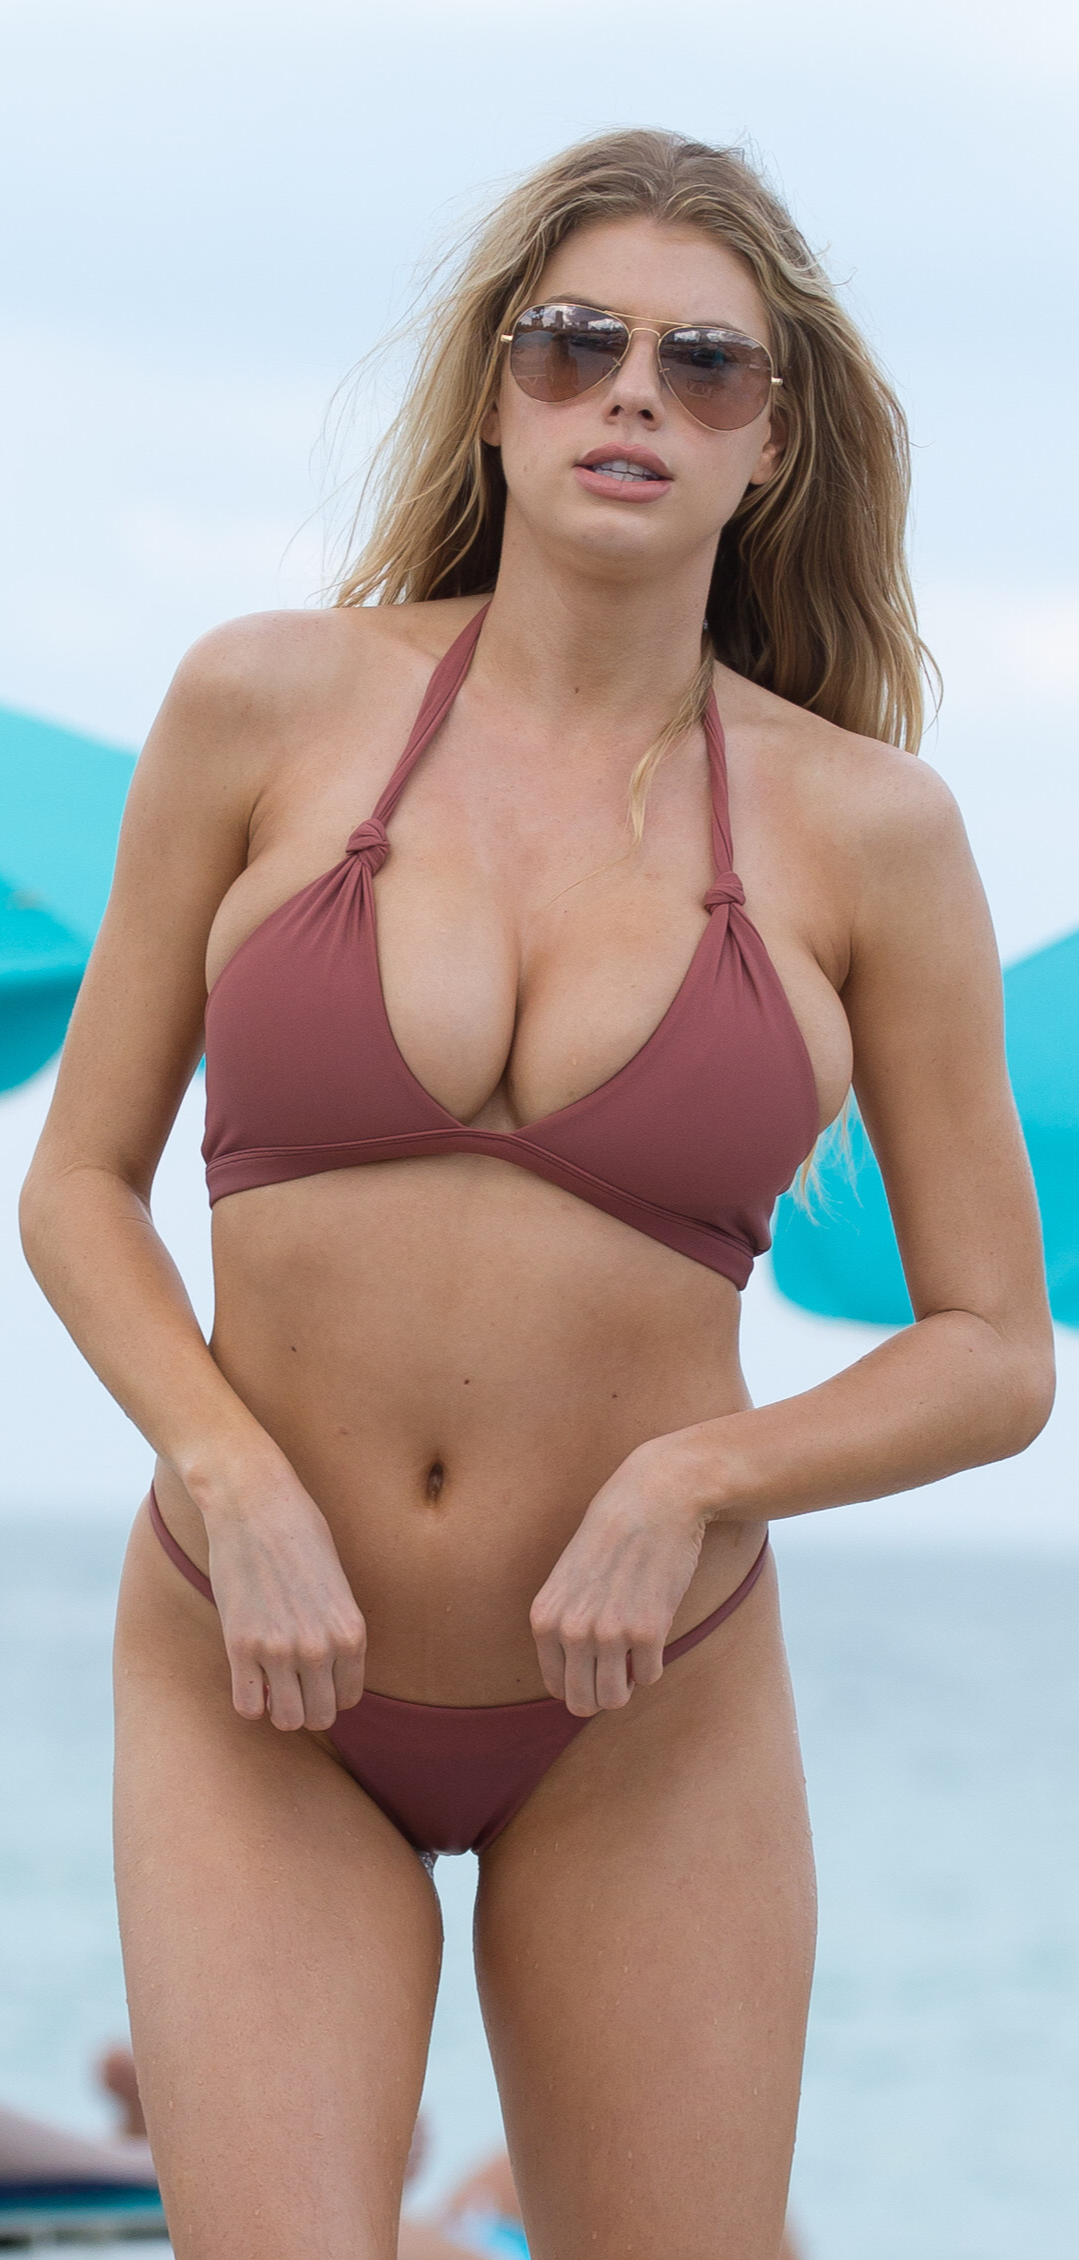 Bikini Charlotte Mckinney nudes (68 photo), Ass, Sideboobs, Instagram, bra 2006